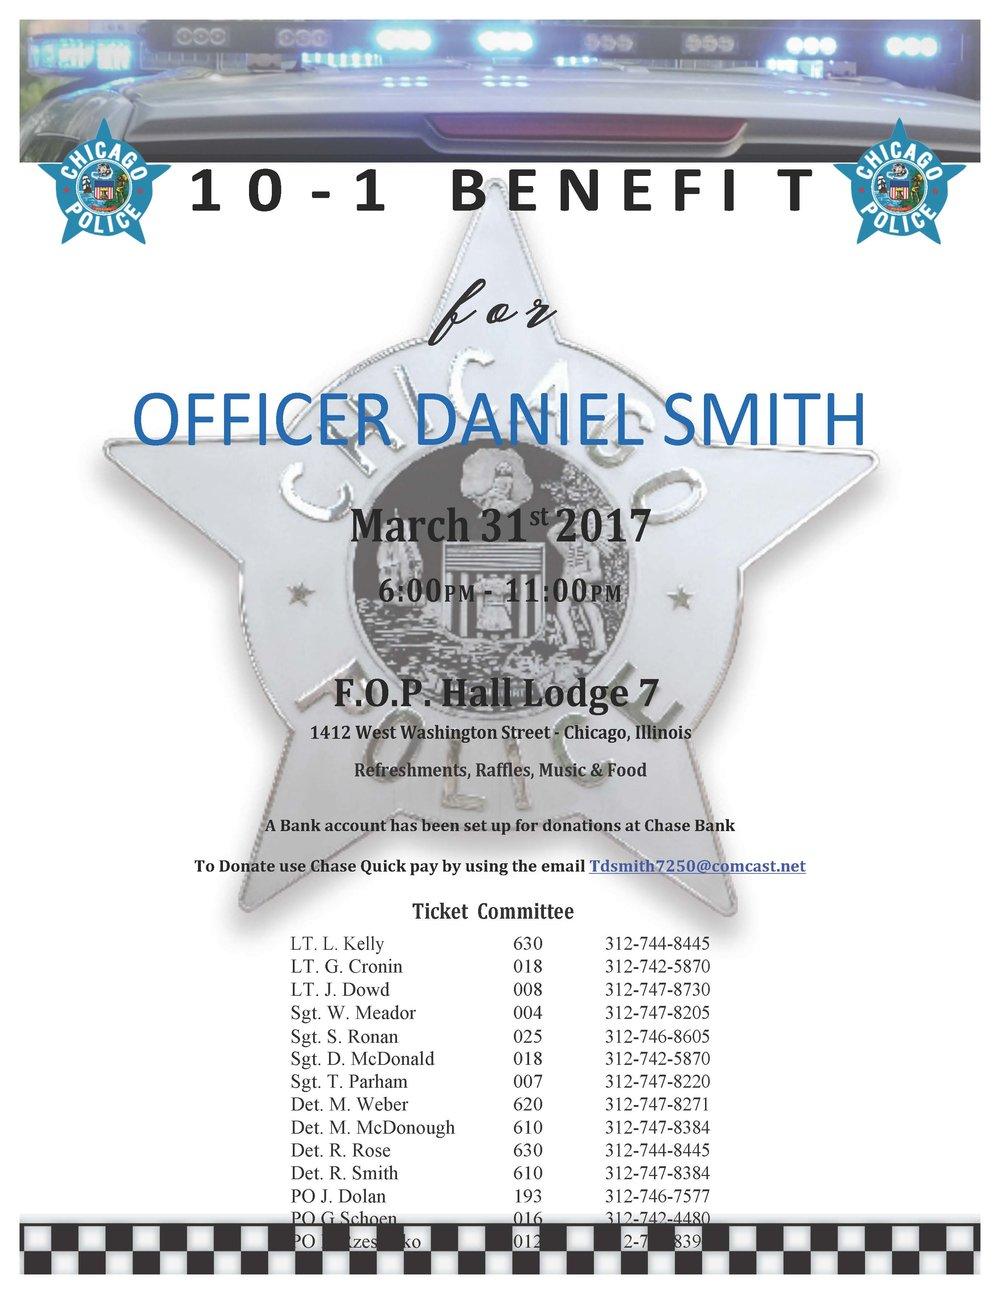 10-1 PO Daniel Smith 2.jpg